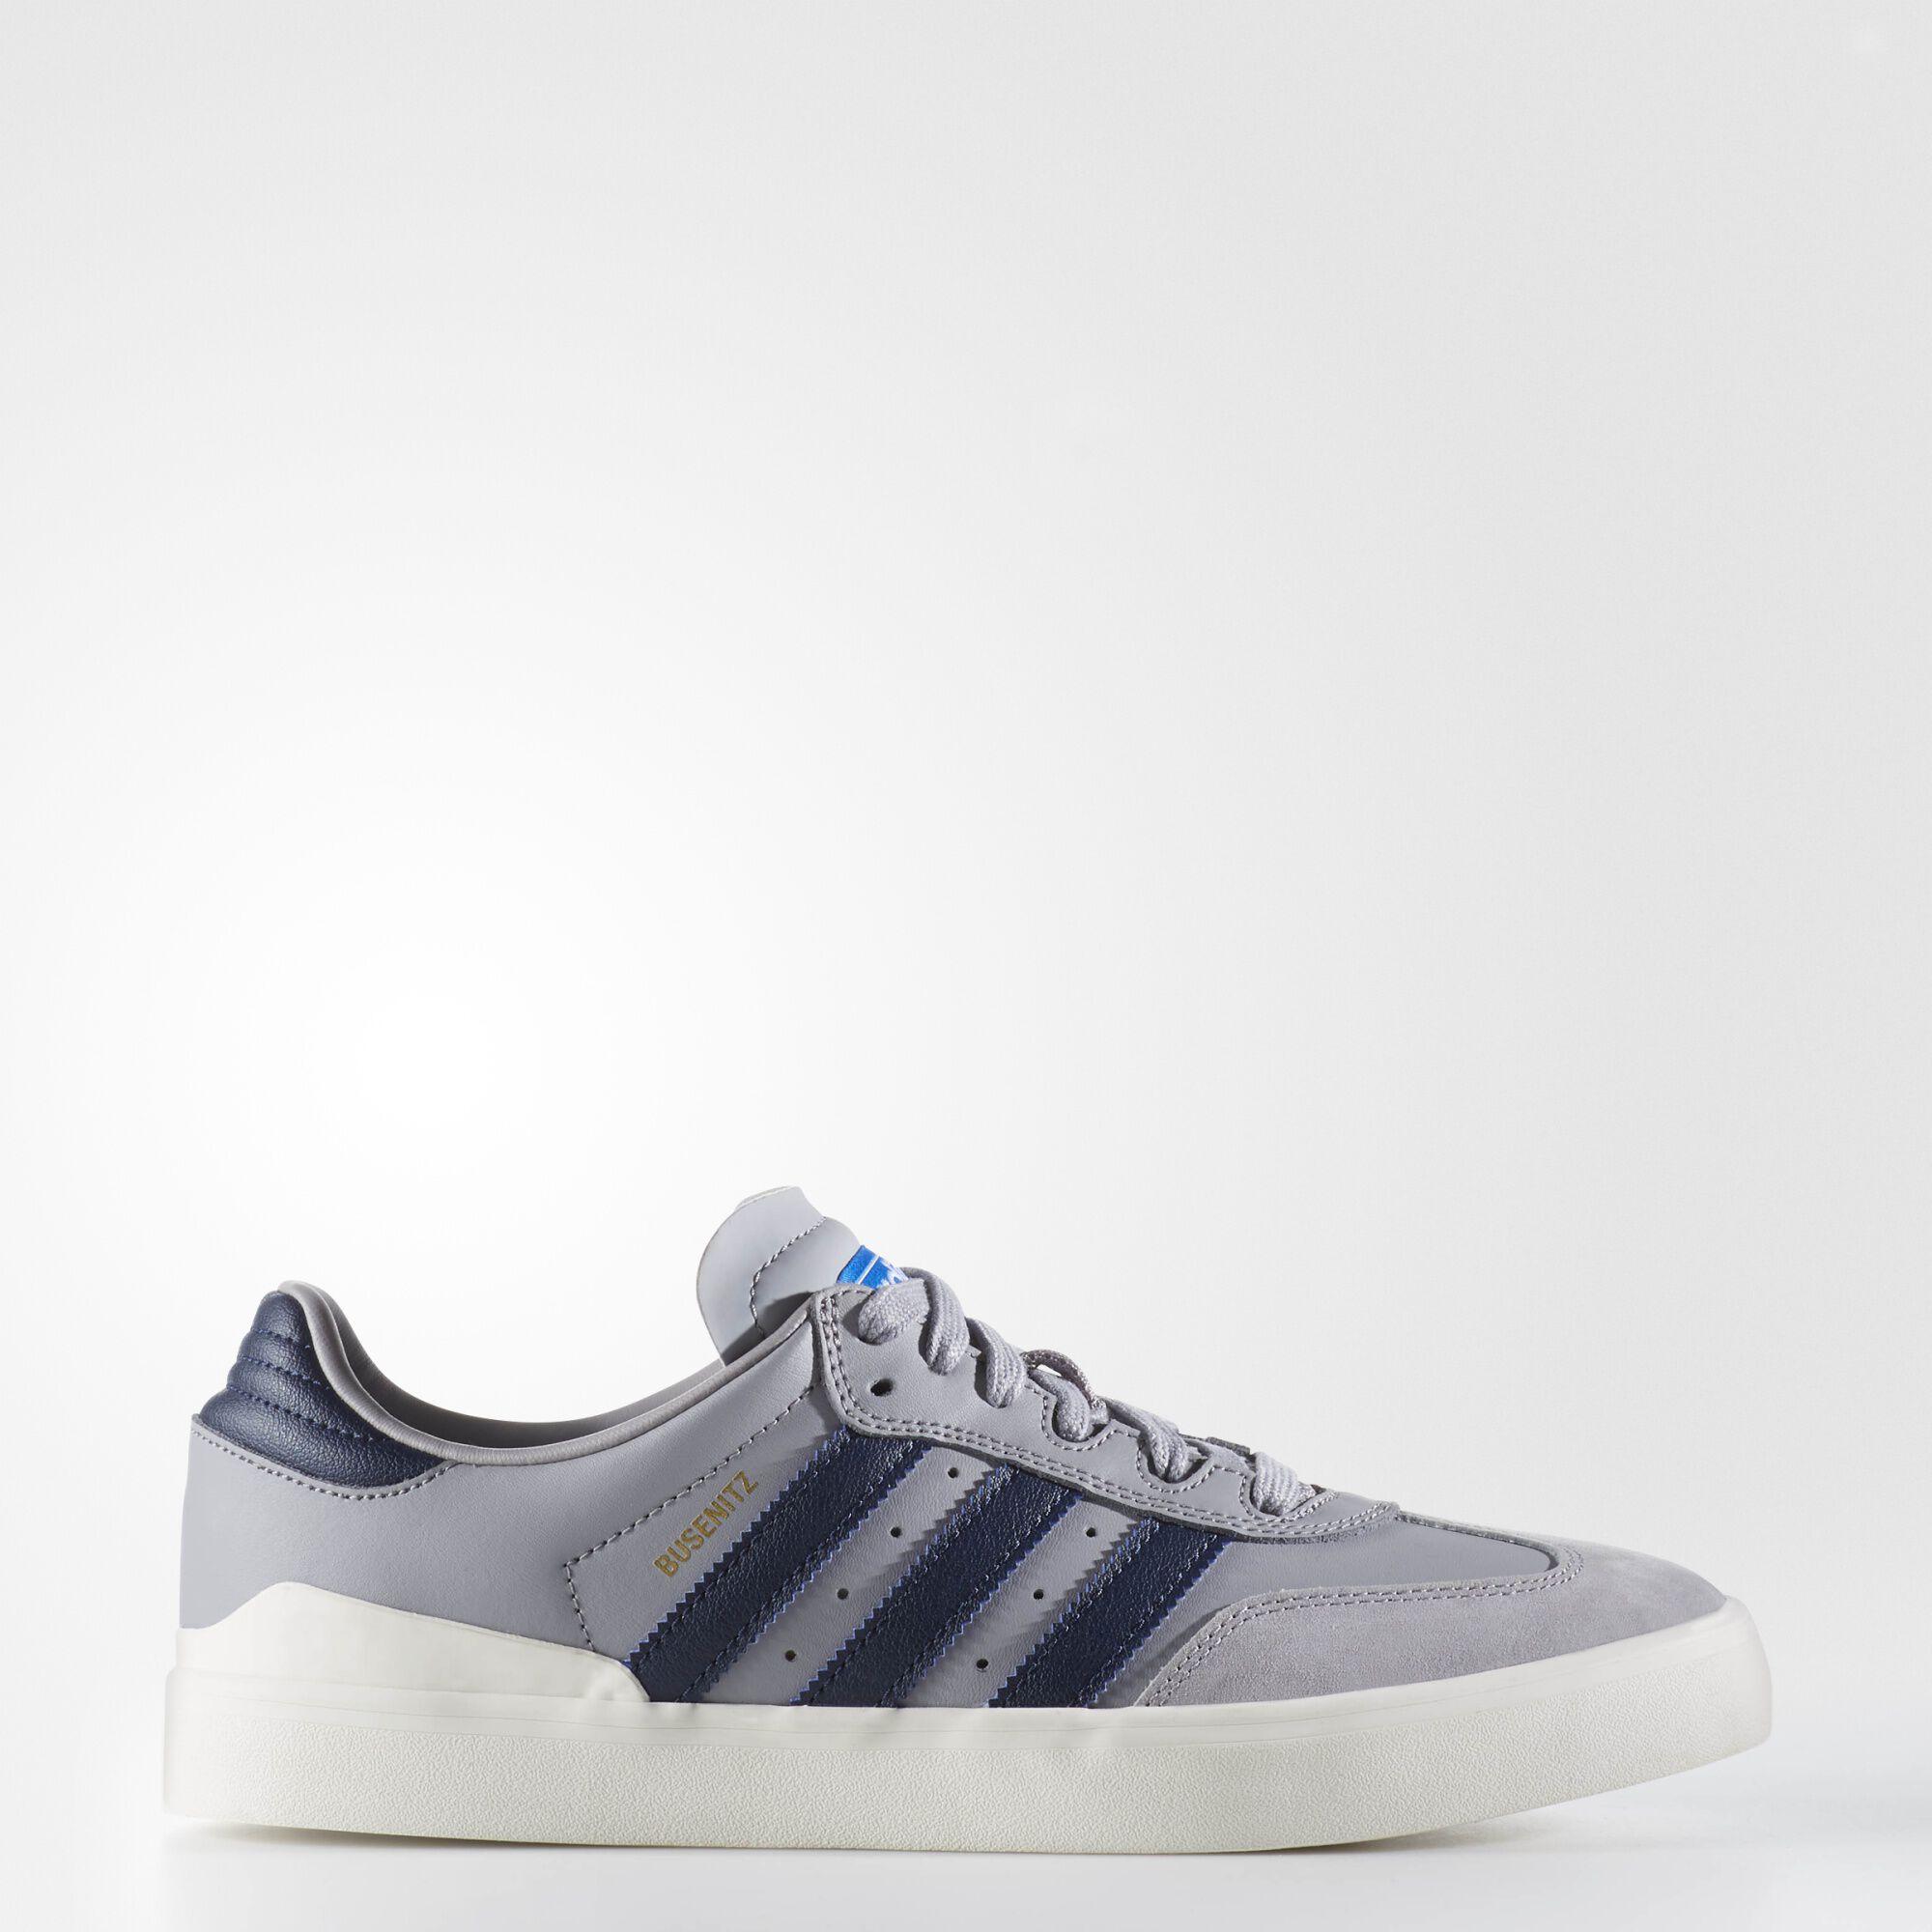 Adidas skate shoes zumiez - Adidas Busenitz Vulc Rx Shoes Light Onix Collegiate Navy Bluebird By4236